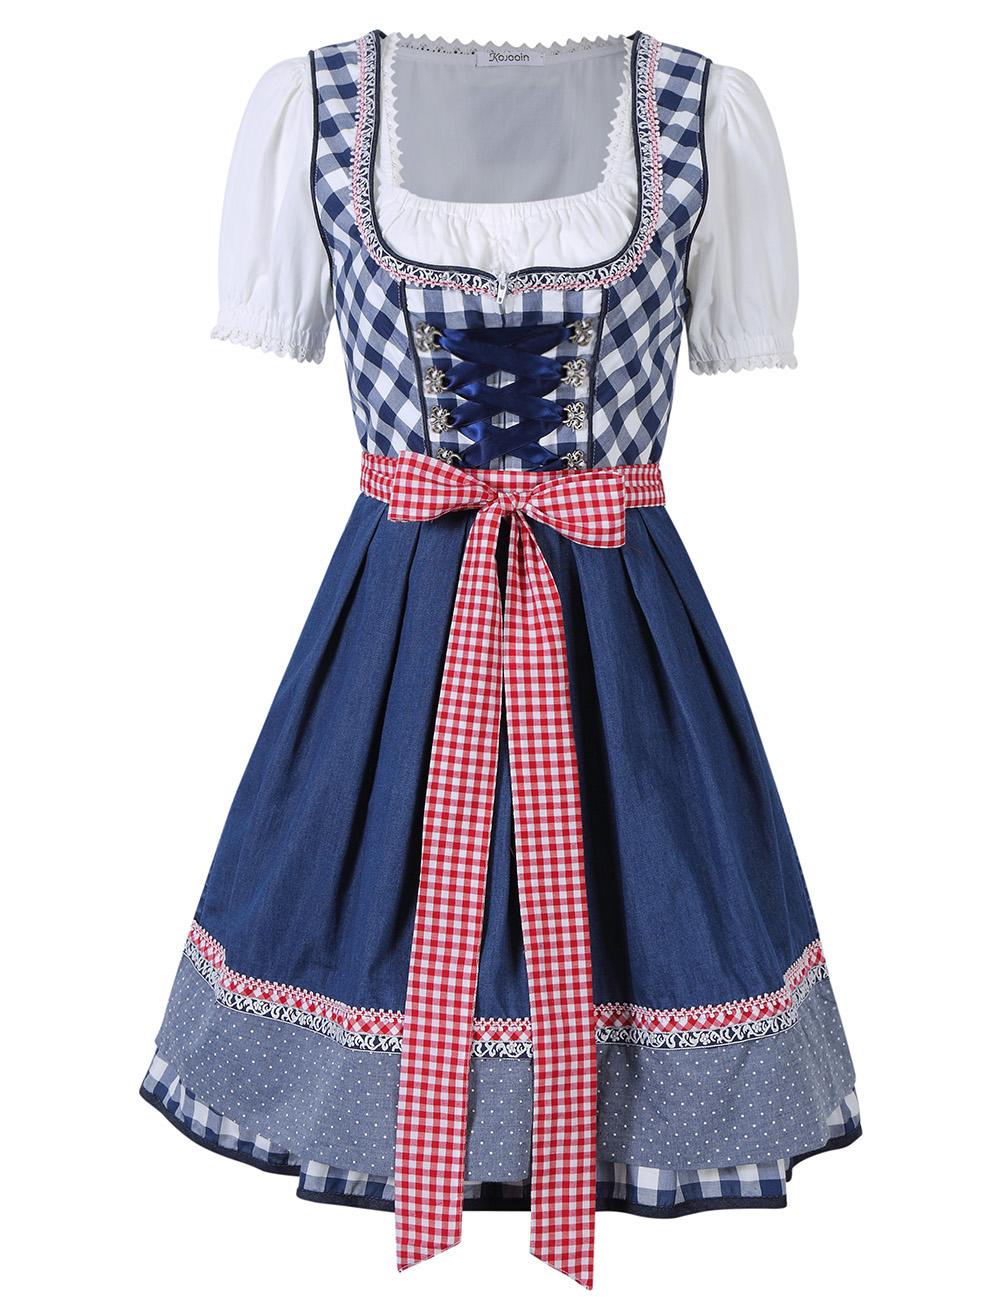 Kojooin Women 3 Pieces Bavarian Oktoberfest Costumes Barmaid Dirndl Dress Blue_Forty-two